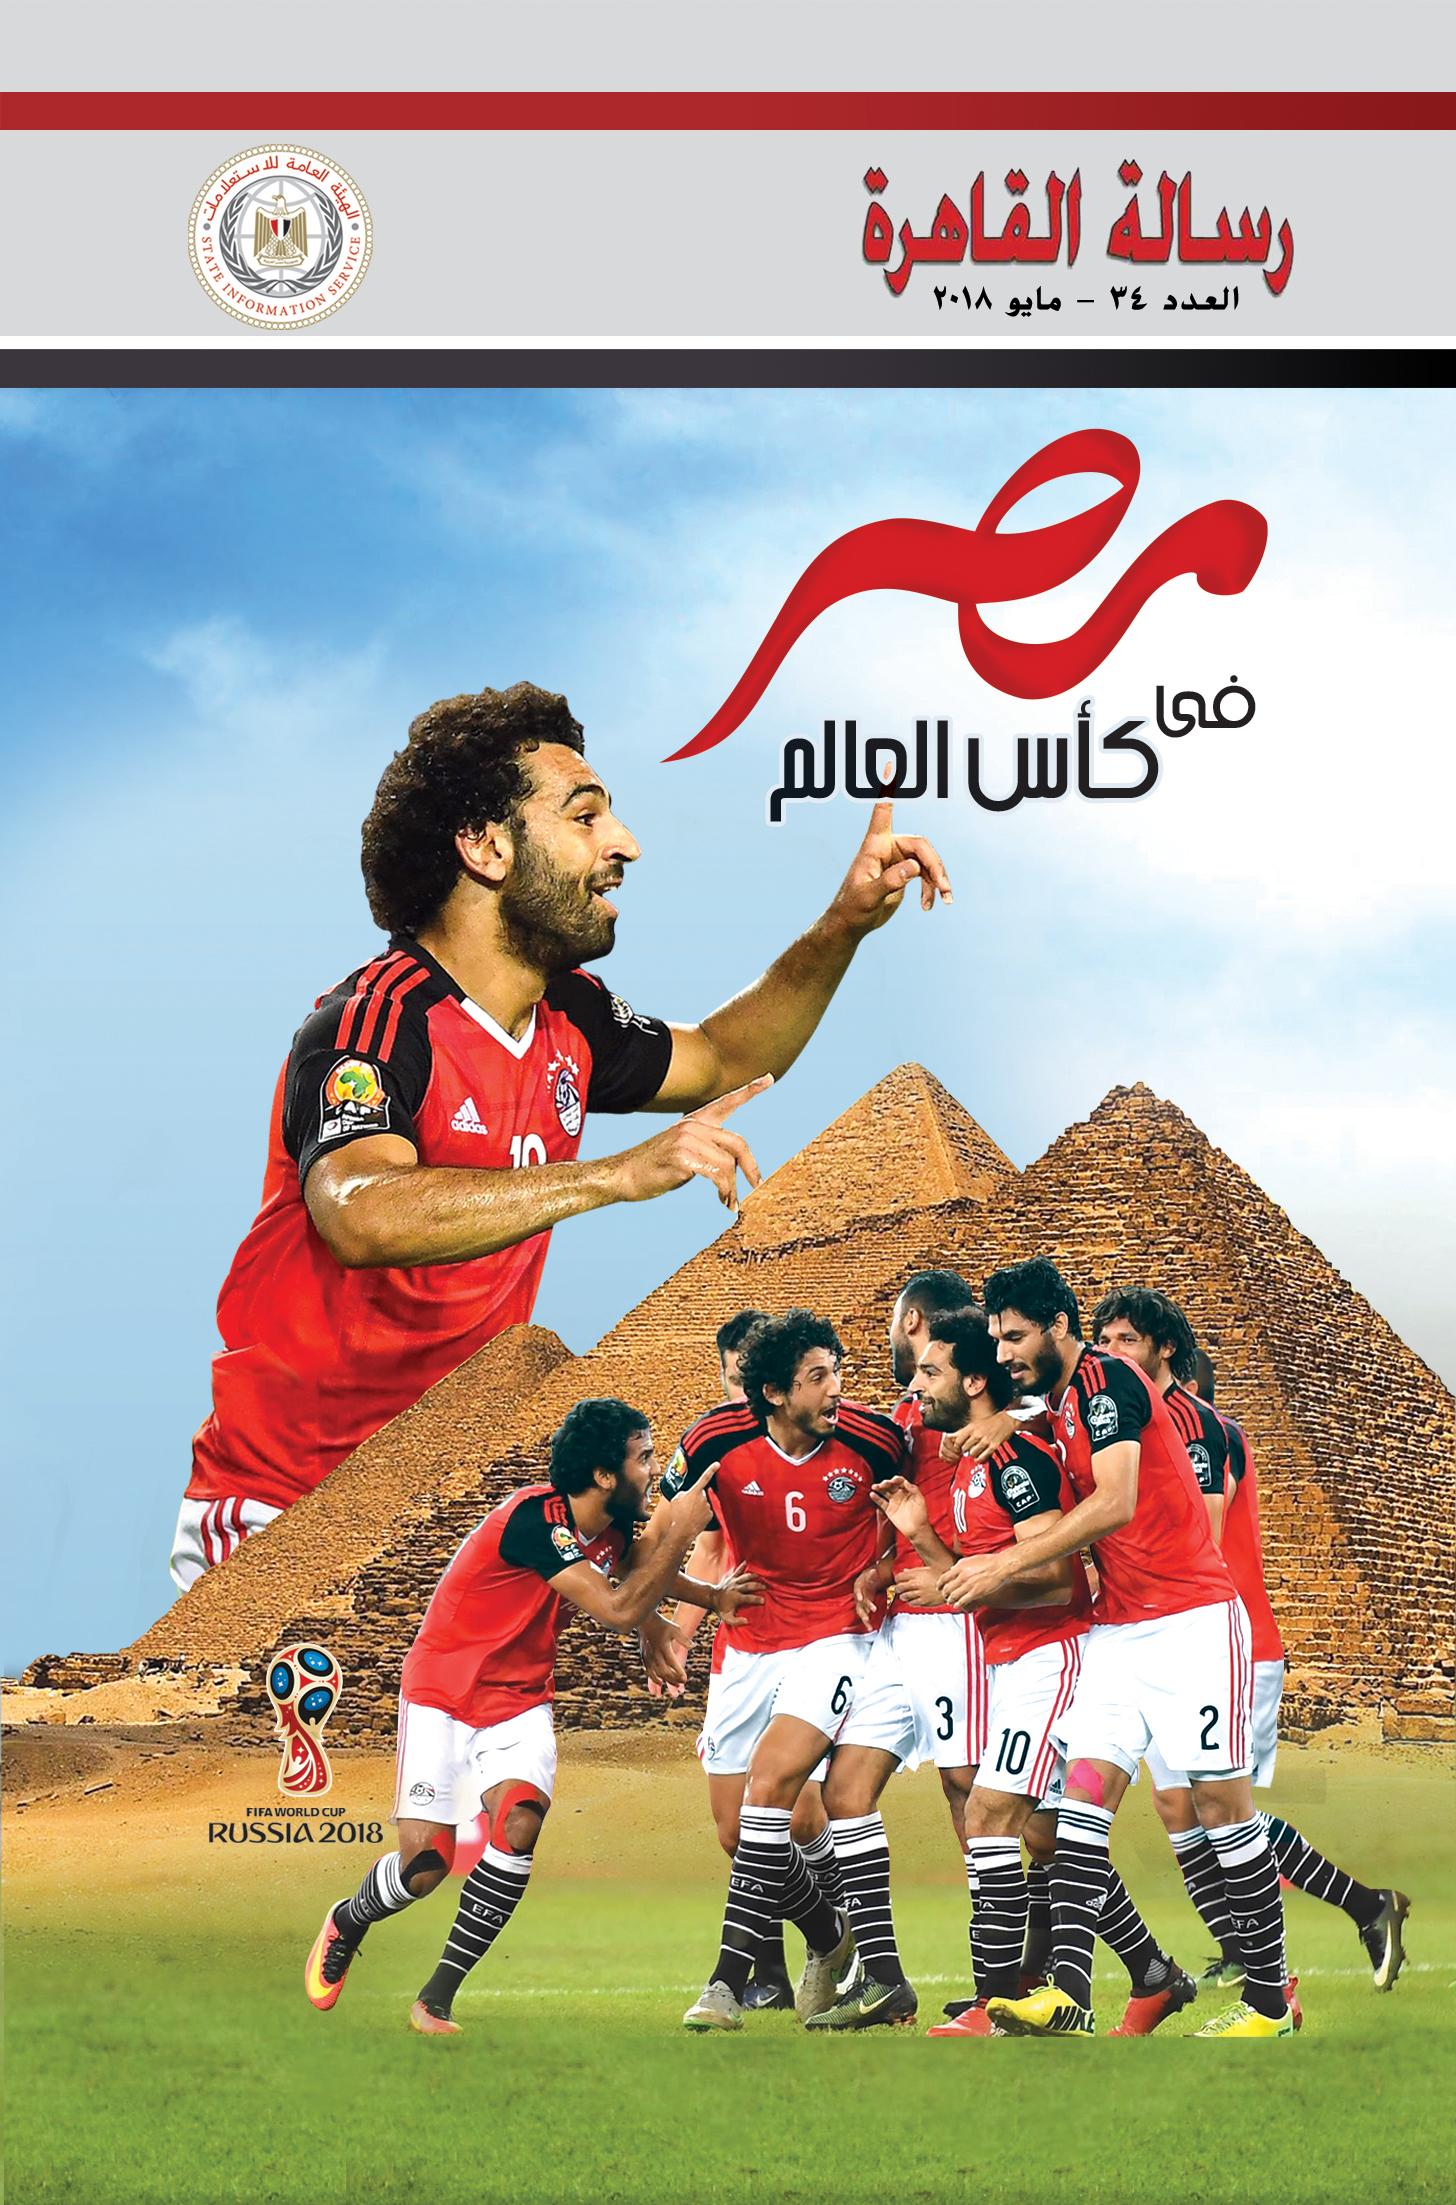 62018131341788-غلاف عربي